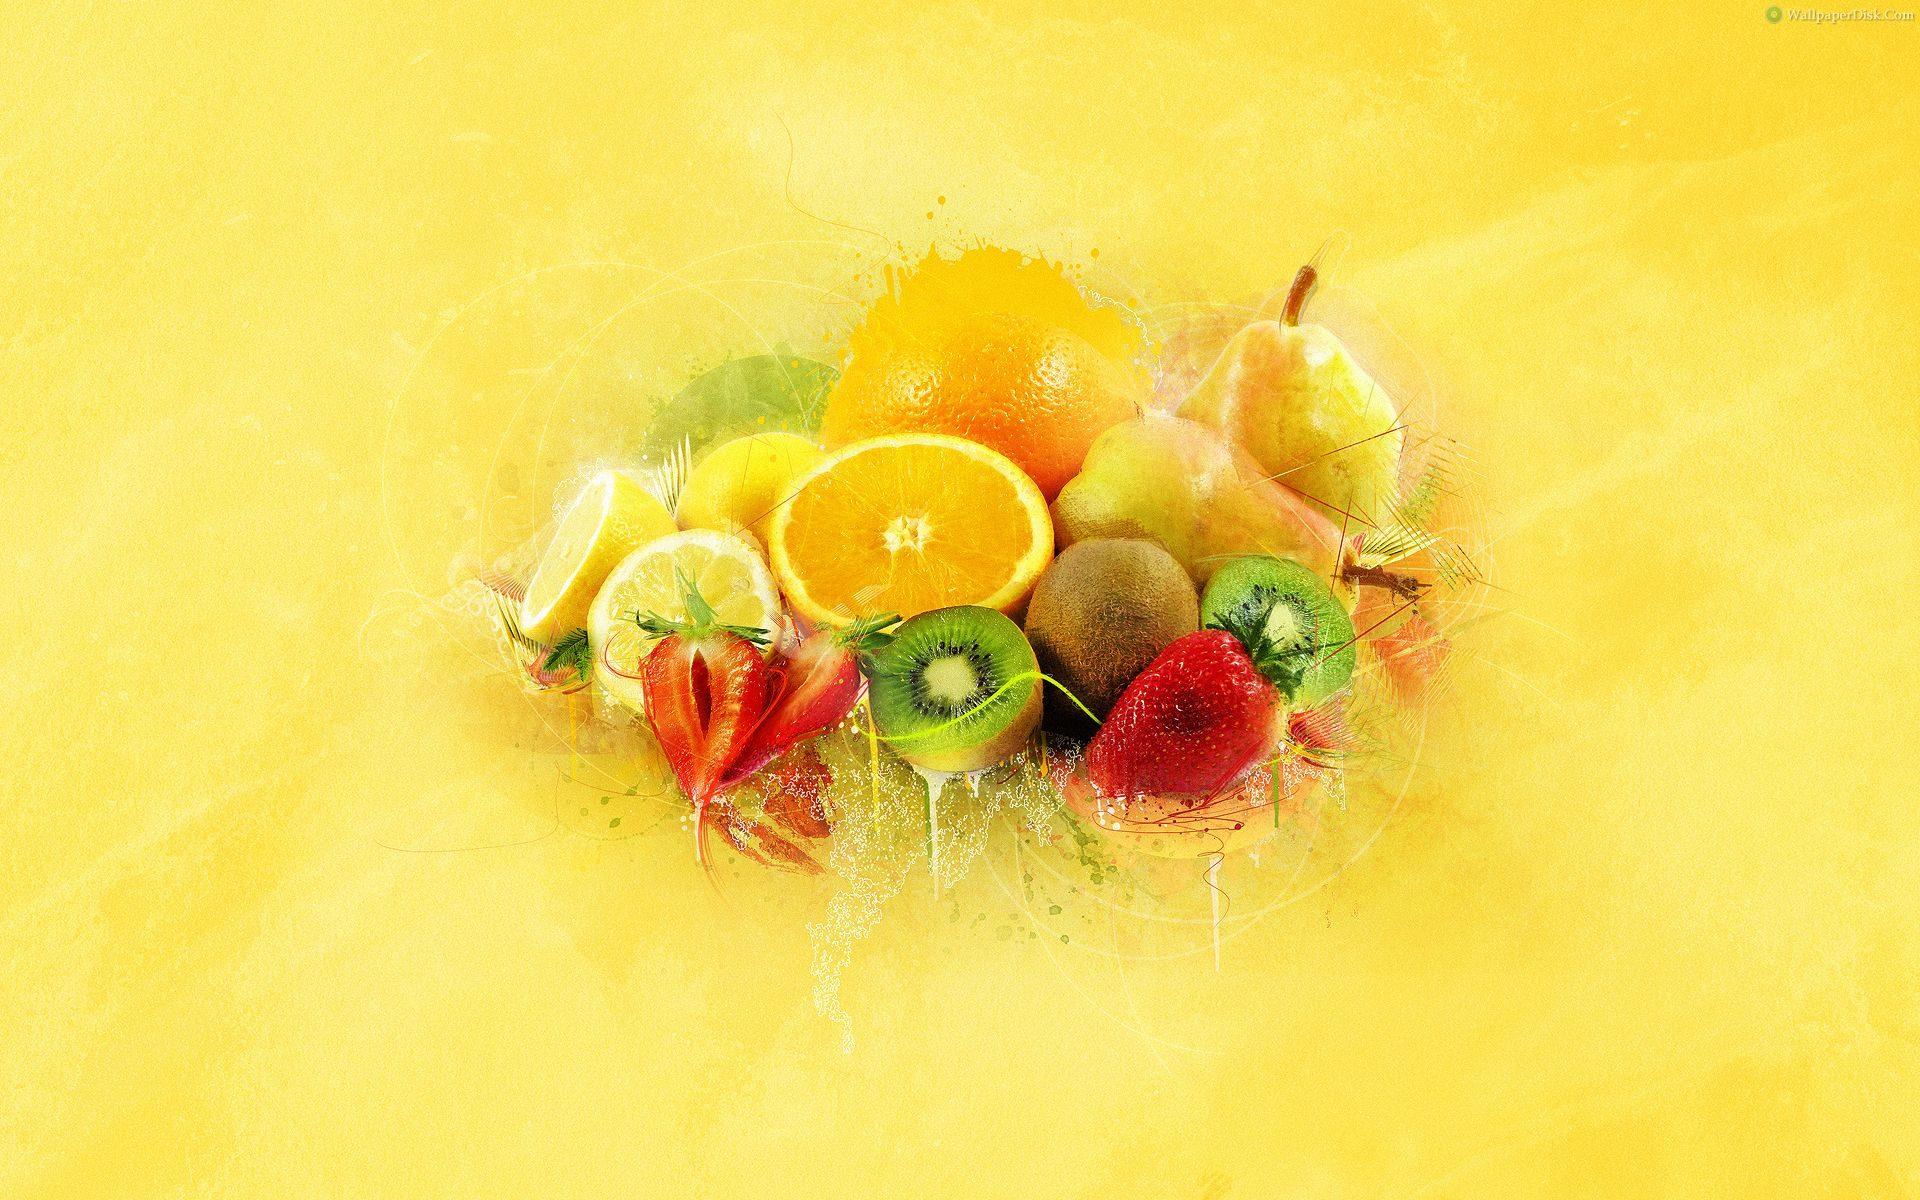 3d Cross Wallpaper Desktop Download Free Fruit Wallpapers Pixelstalk Net